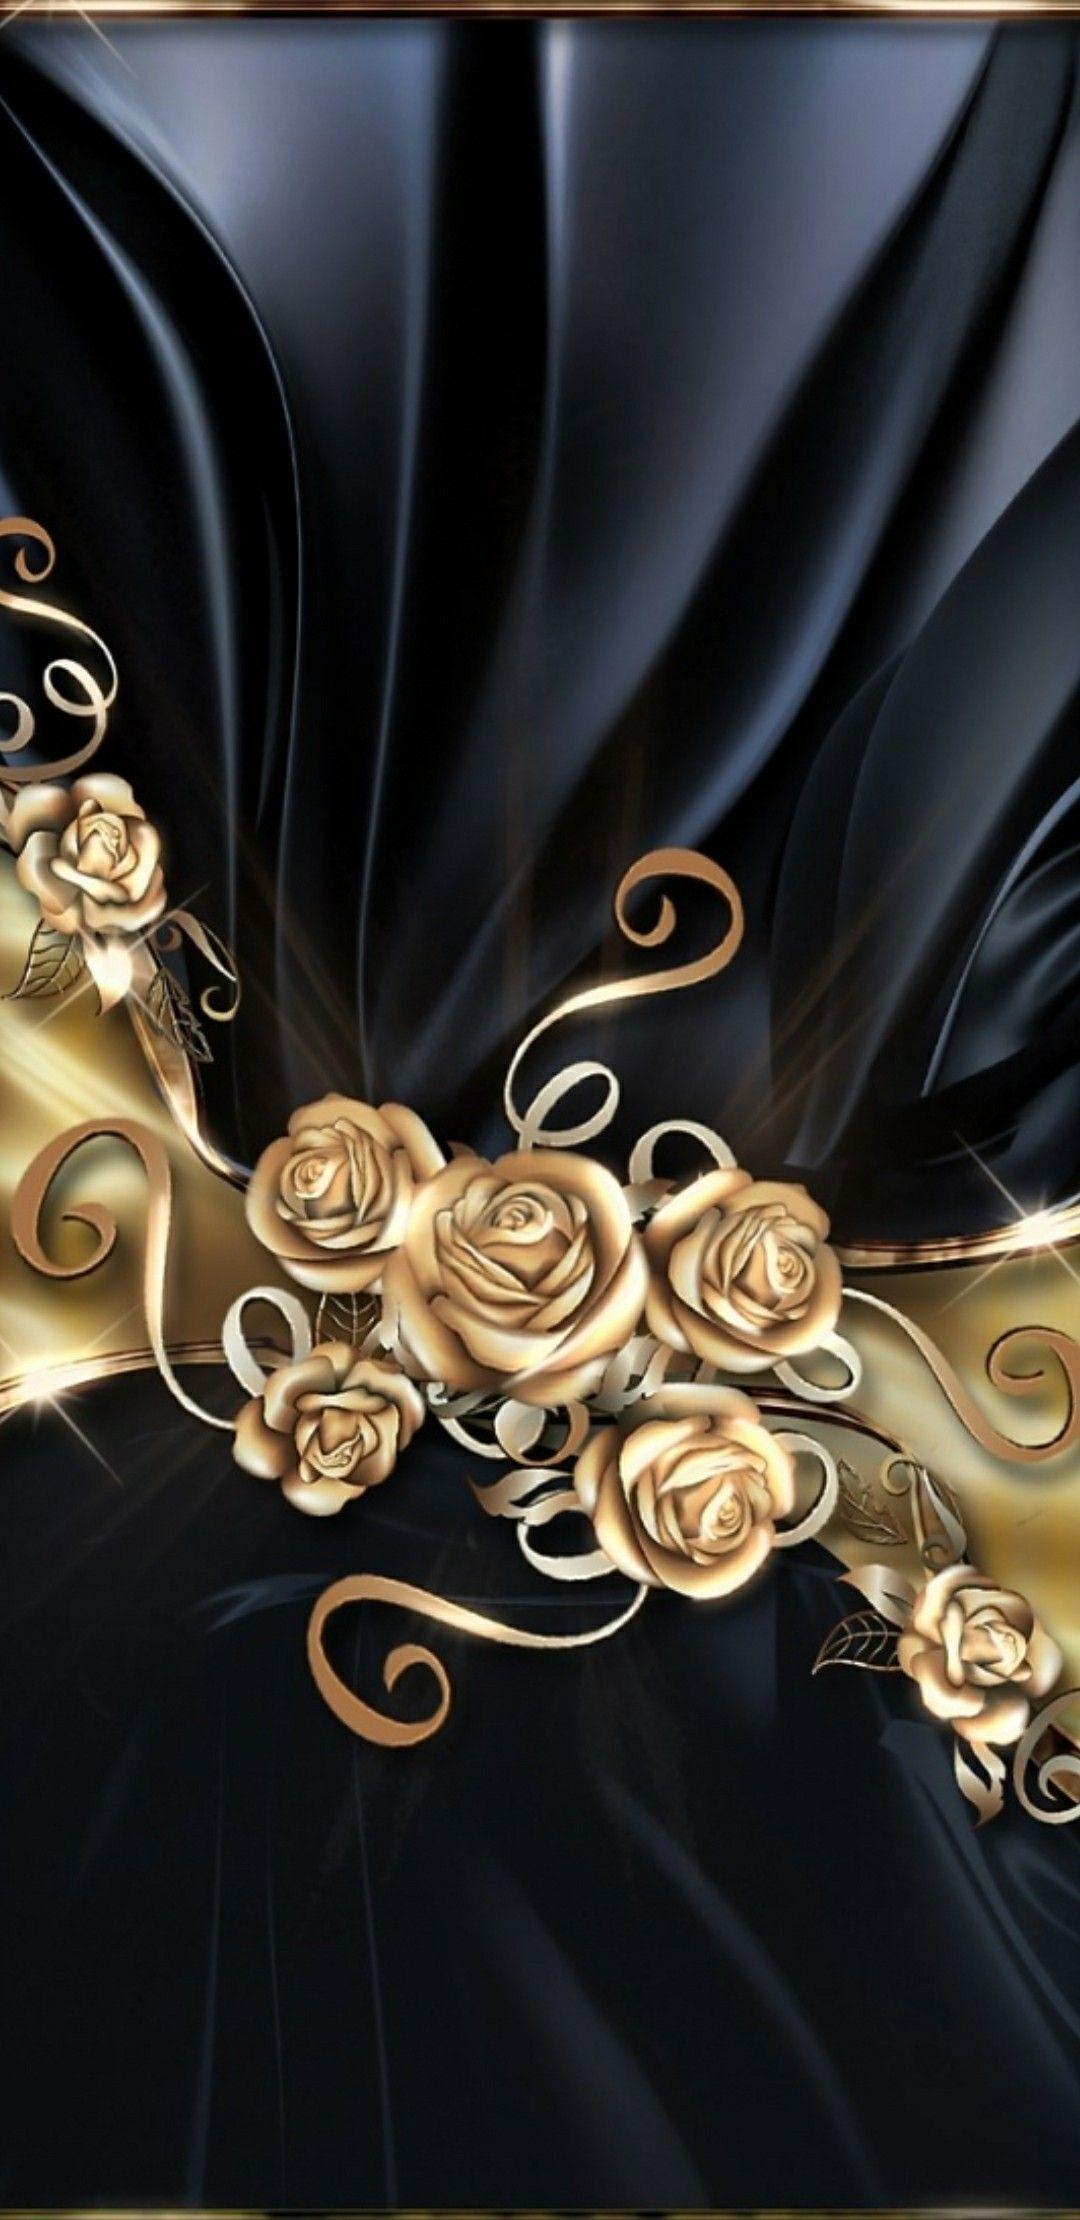 Black And Gold Black Cellphonewallpapergold Gold Phone Wallpaper Patterns Gold Wallpaper Bling Wallpaper